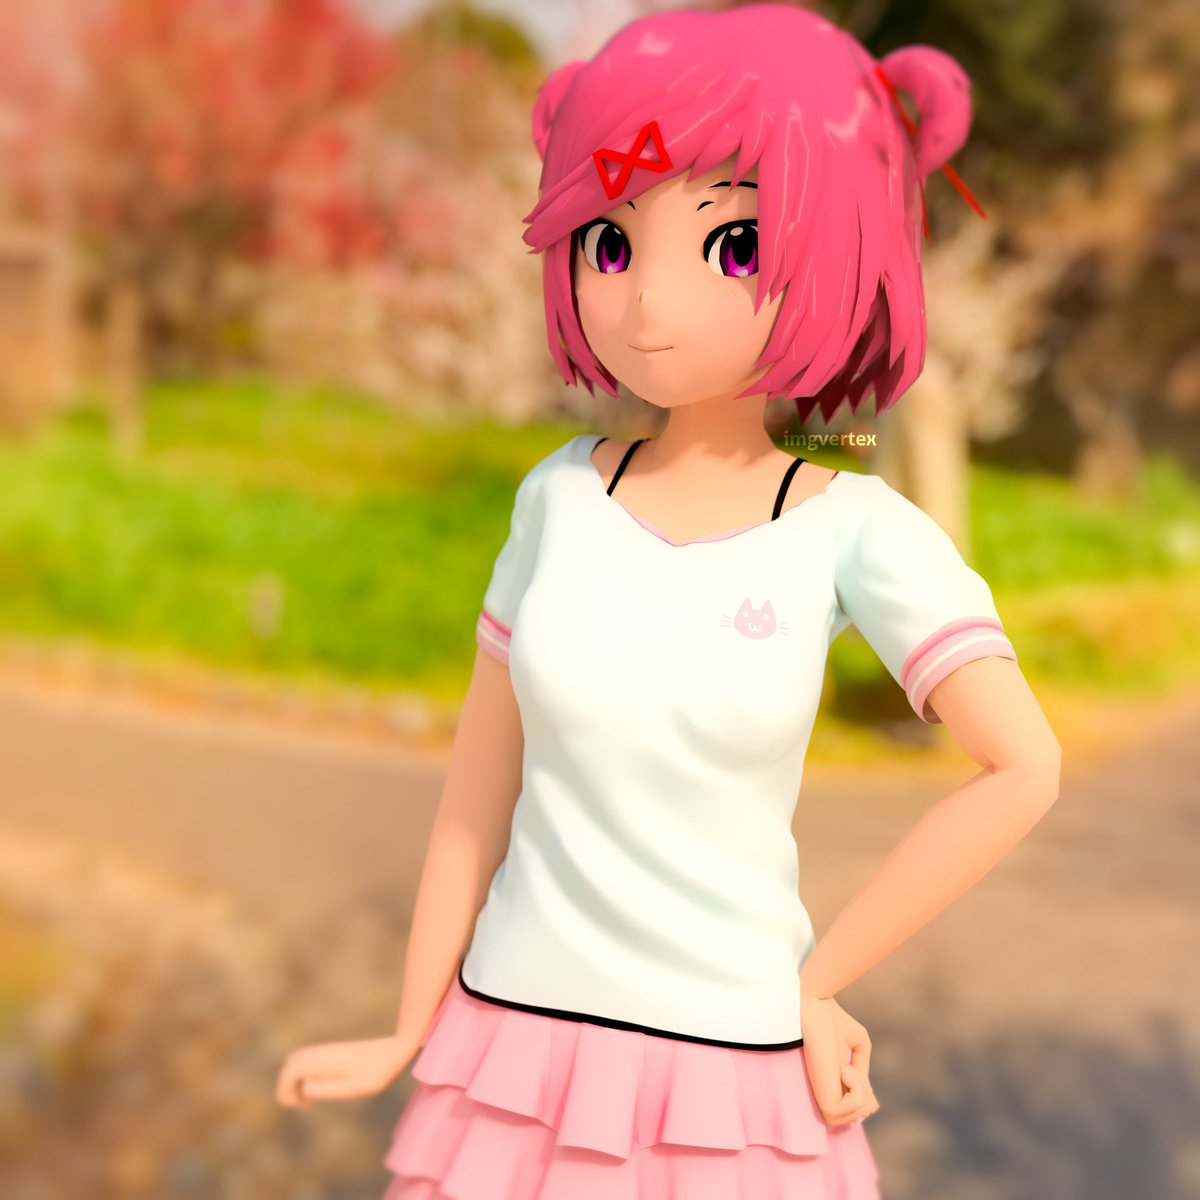 U30d9u30ebu30c6u30c3u30afu30b9 VERTEX on Twitter u0026quot;Done #Natsuki #3D #Model #ddlc #DokiDokiLiteratureClub #anime #vn ...